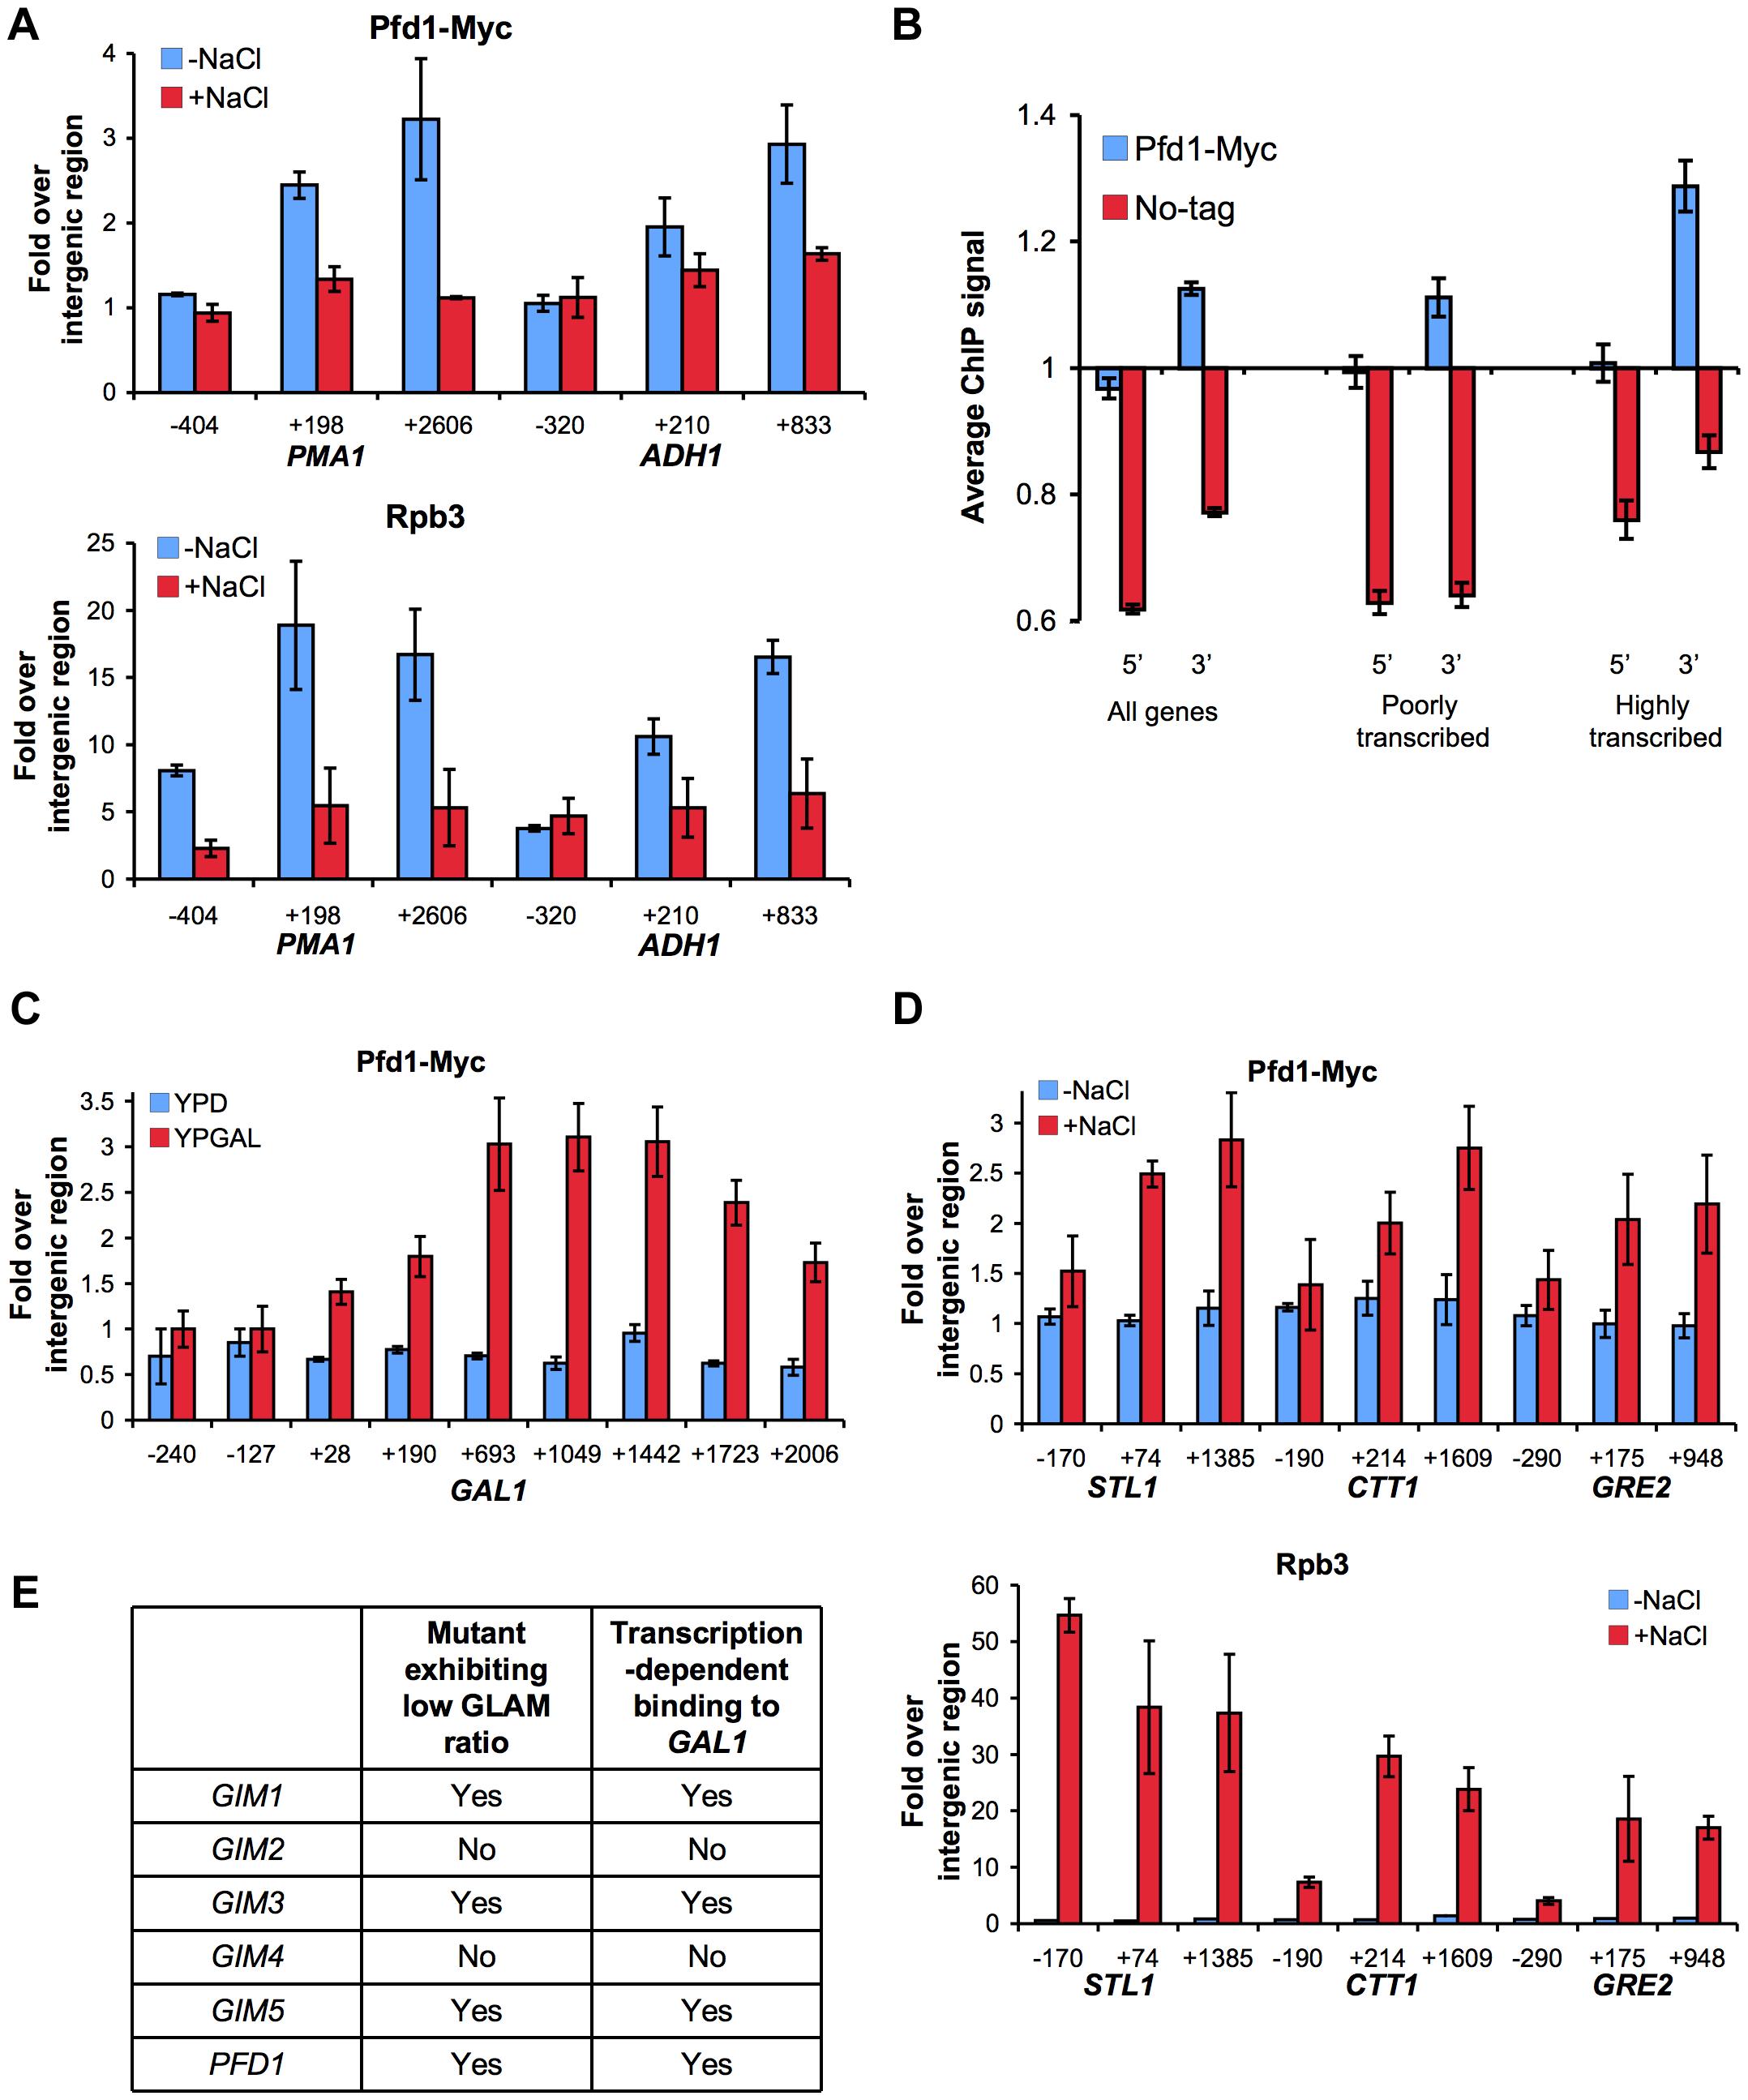 Prefoldin binds the transcribed region of active genes.